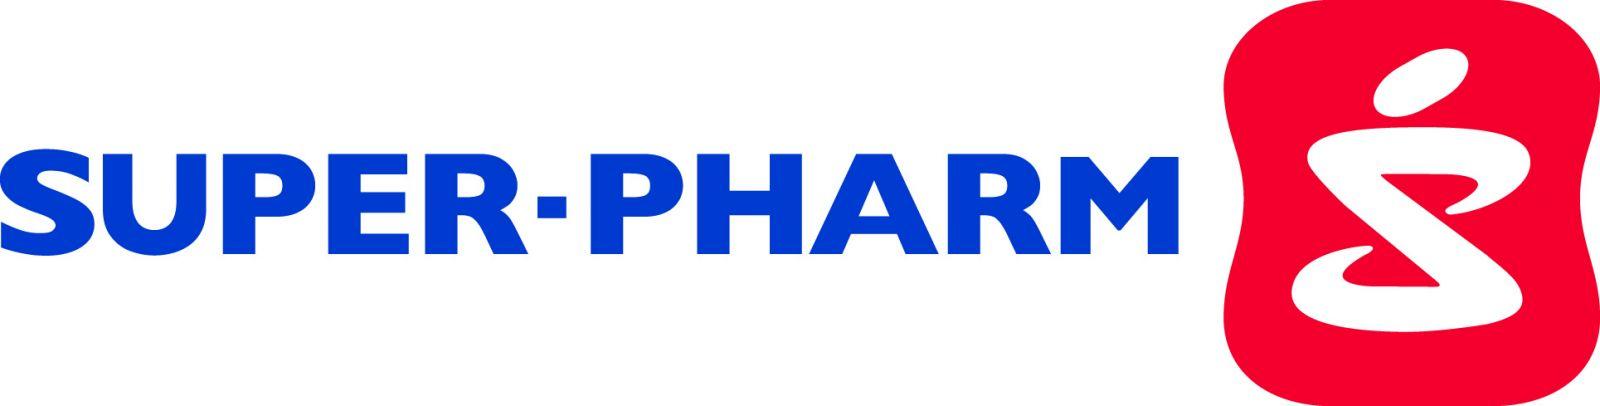 Super-Pharm Logo photo - 1